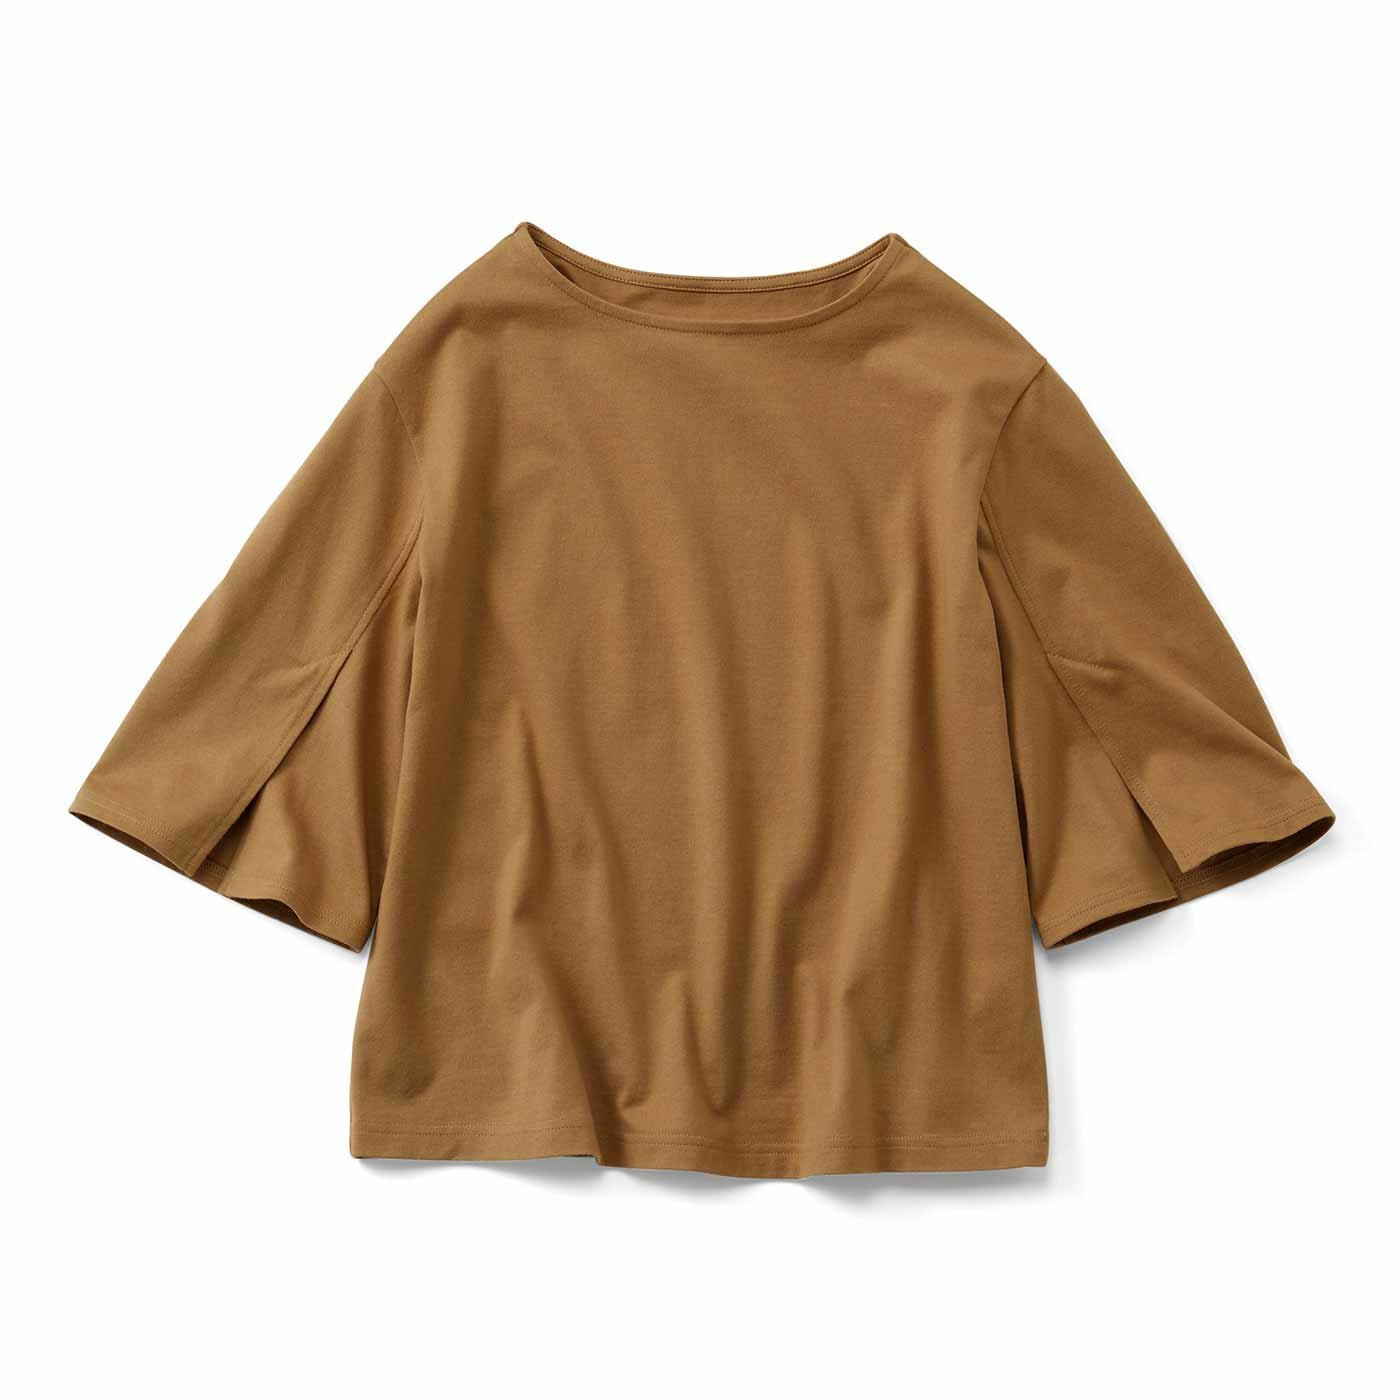 IEDIT[イディット] 消臭機能×コットン100% 袖スリットデザイントップス〈ブラウン〉